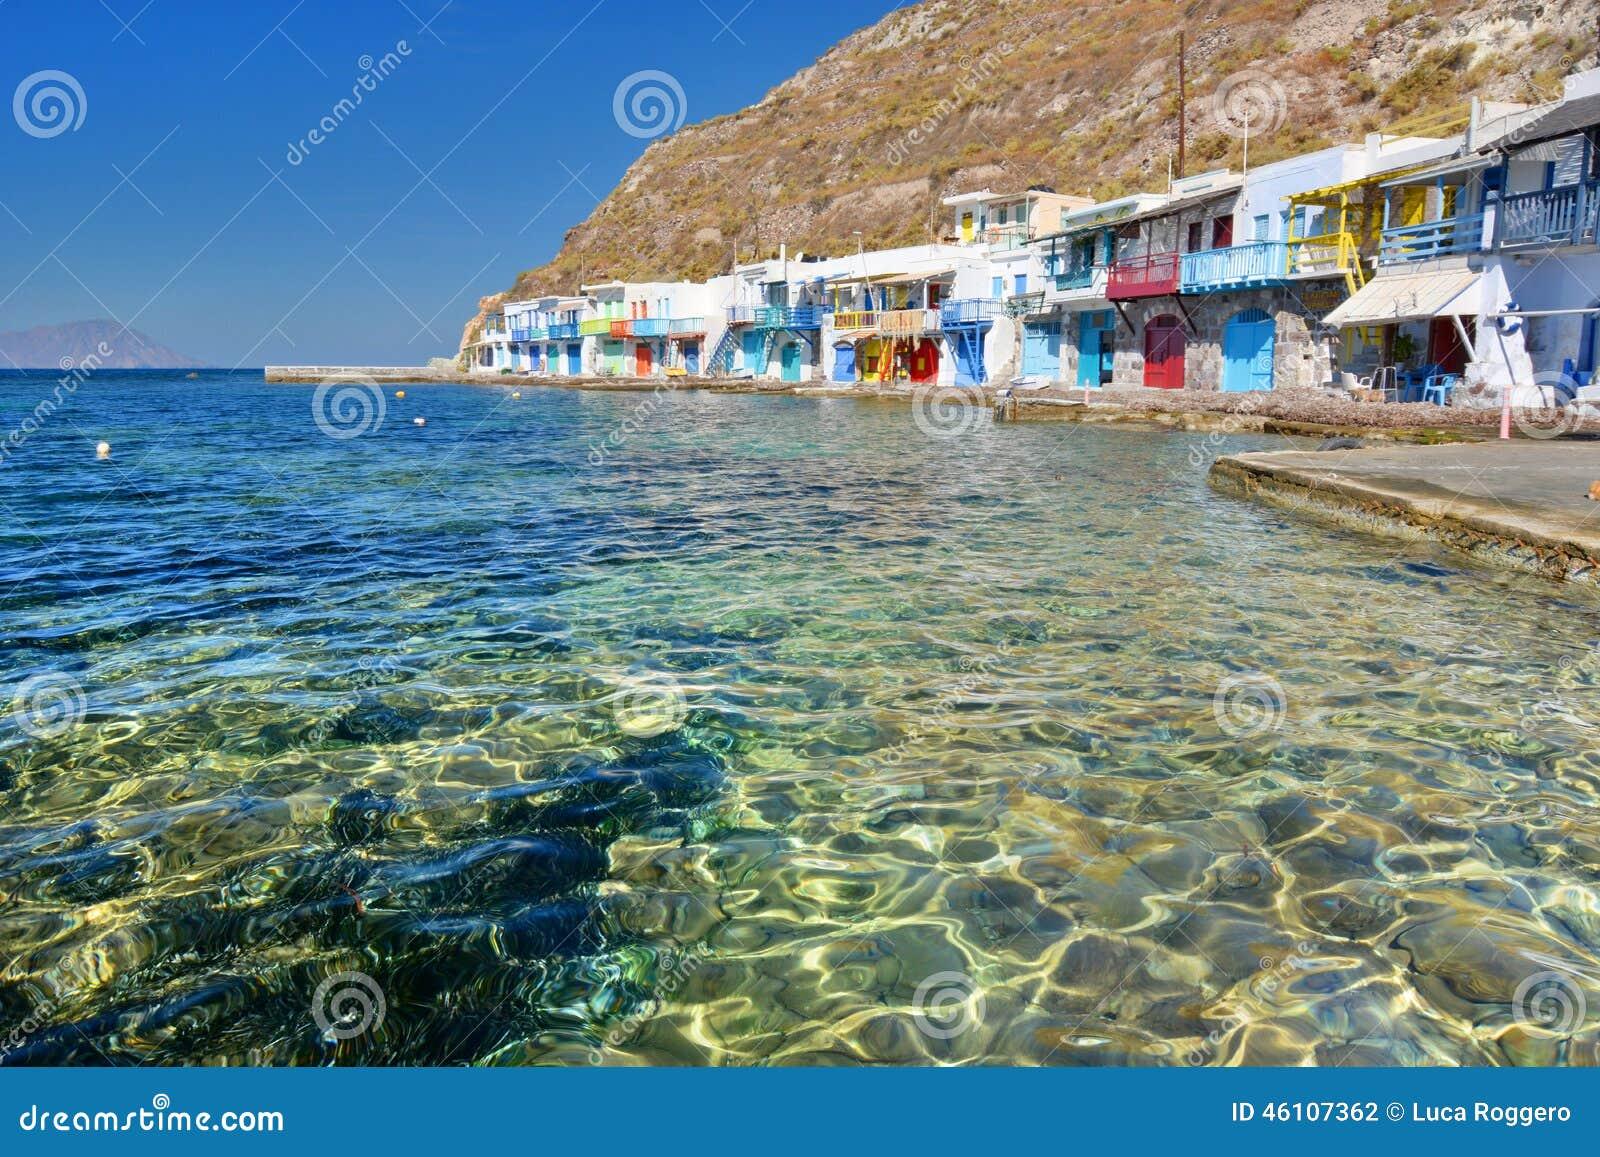 Greece Cyclades Tour